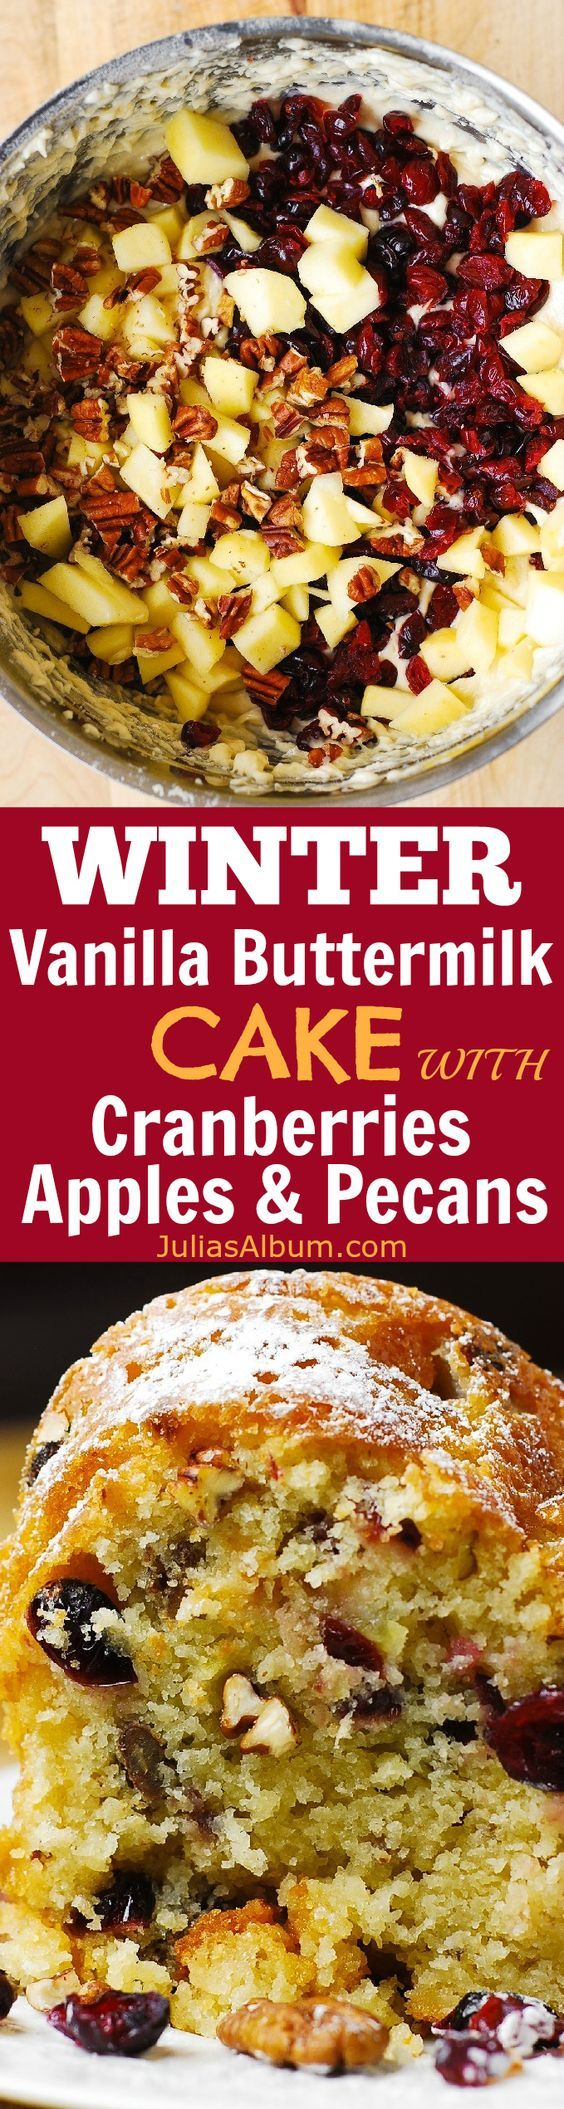 ... winter recipes pecans cranberries vanilla apples cakes winter holiday